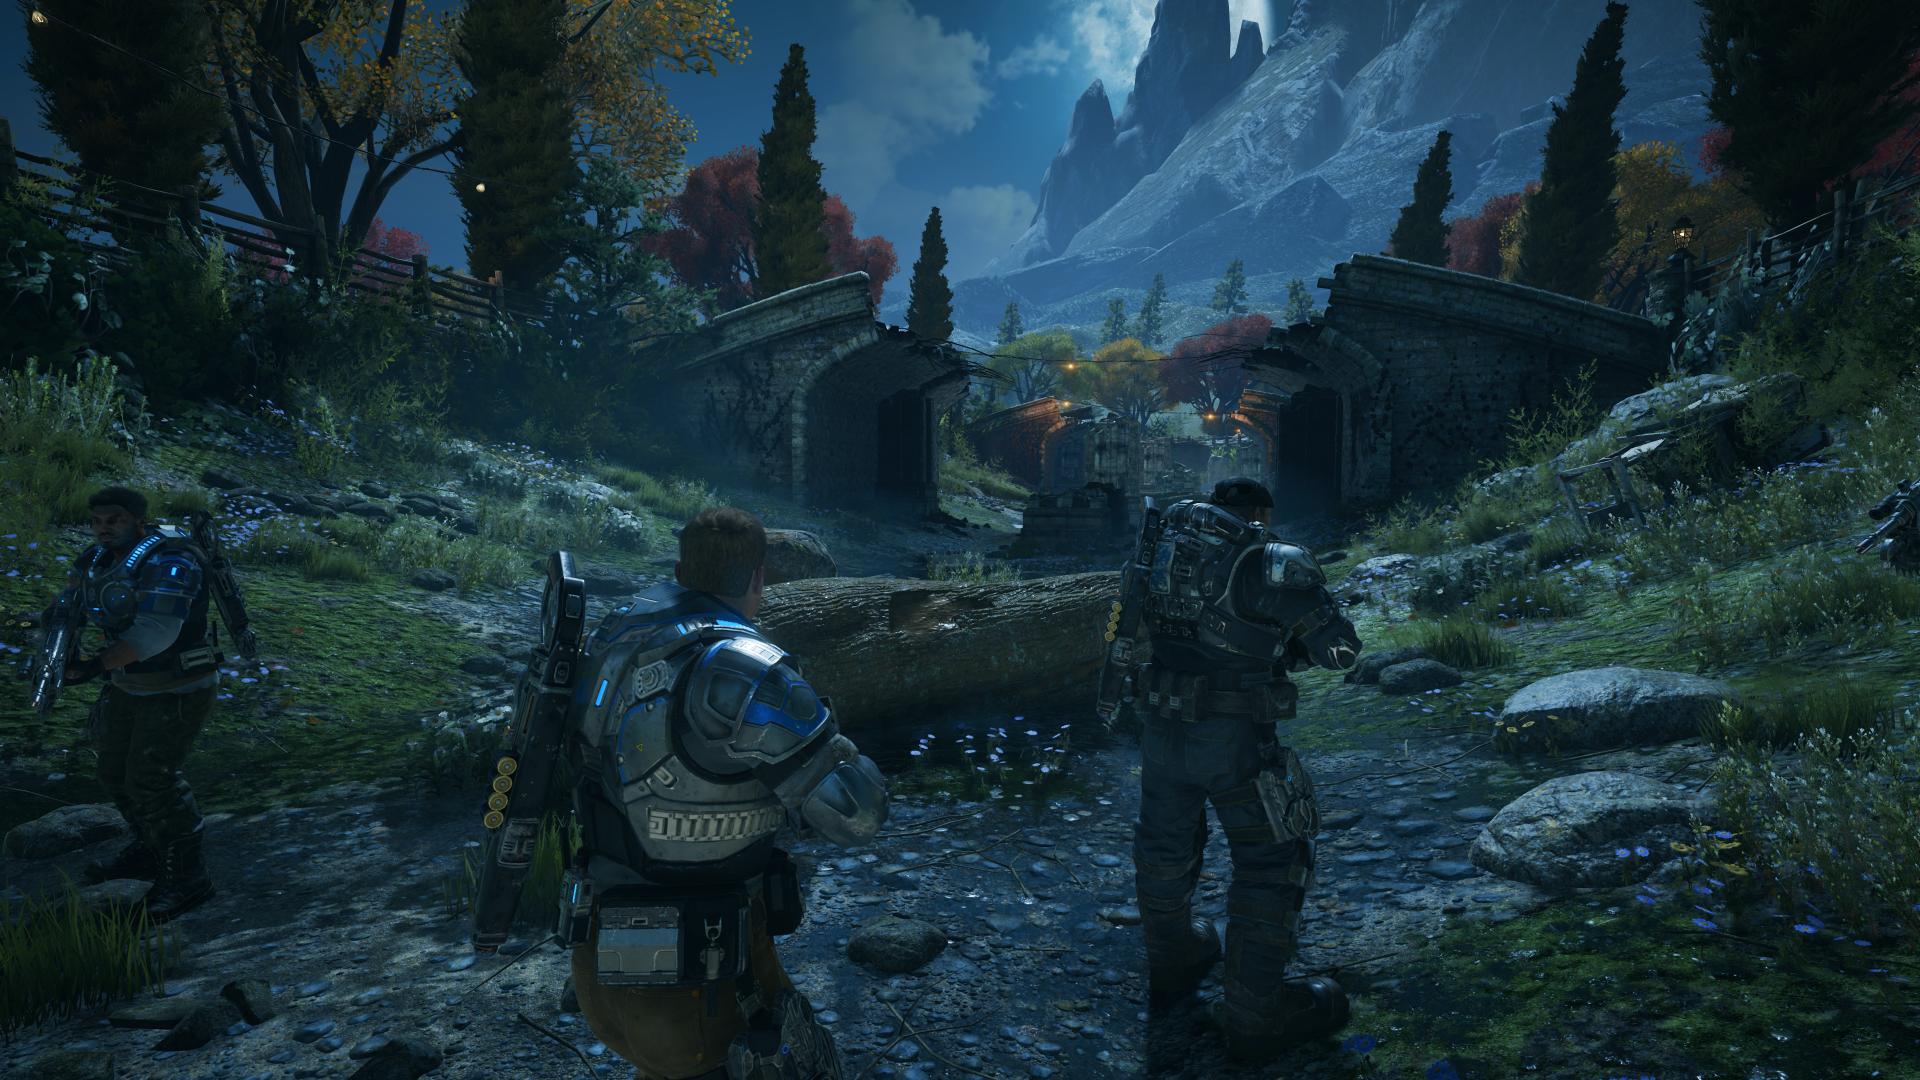 Gears Of War 4 Ultrawide: GeForce.com Gears Of War 4 Screen Space Shadow Quality